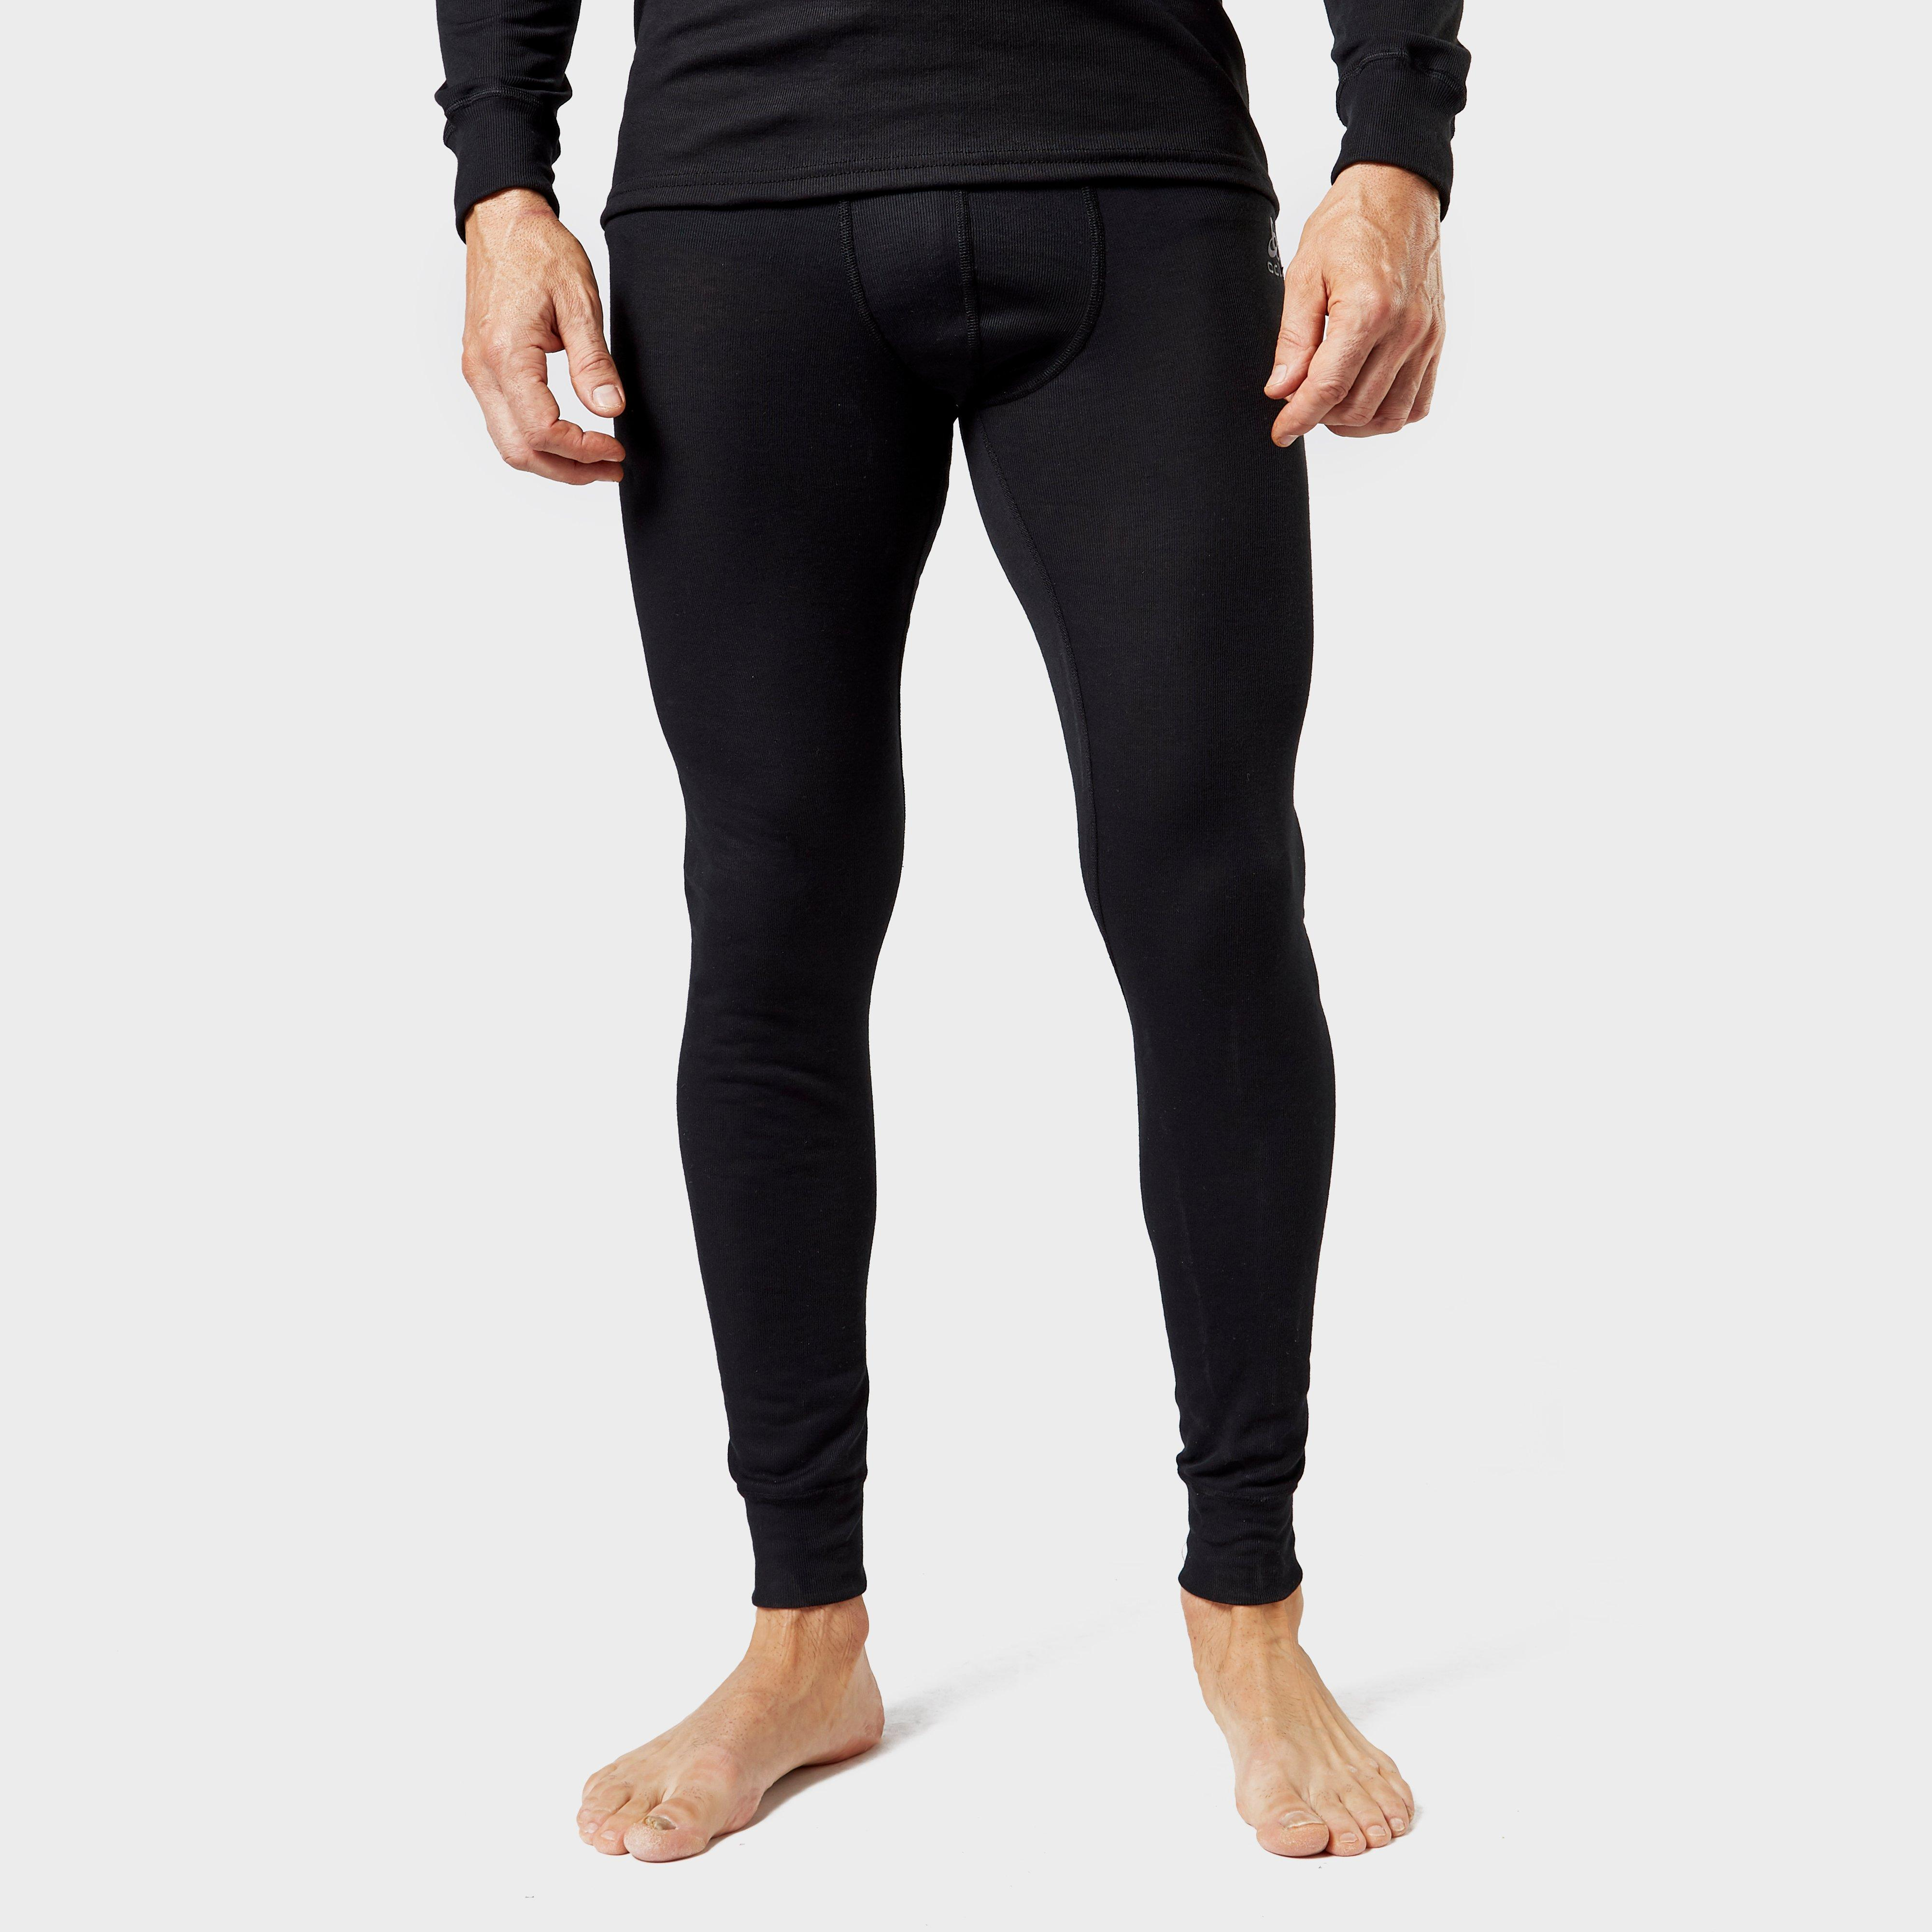 Odlo Odlo Mens Active Warm Legging Base Layer Pants - Black, Black